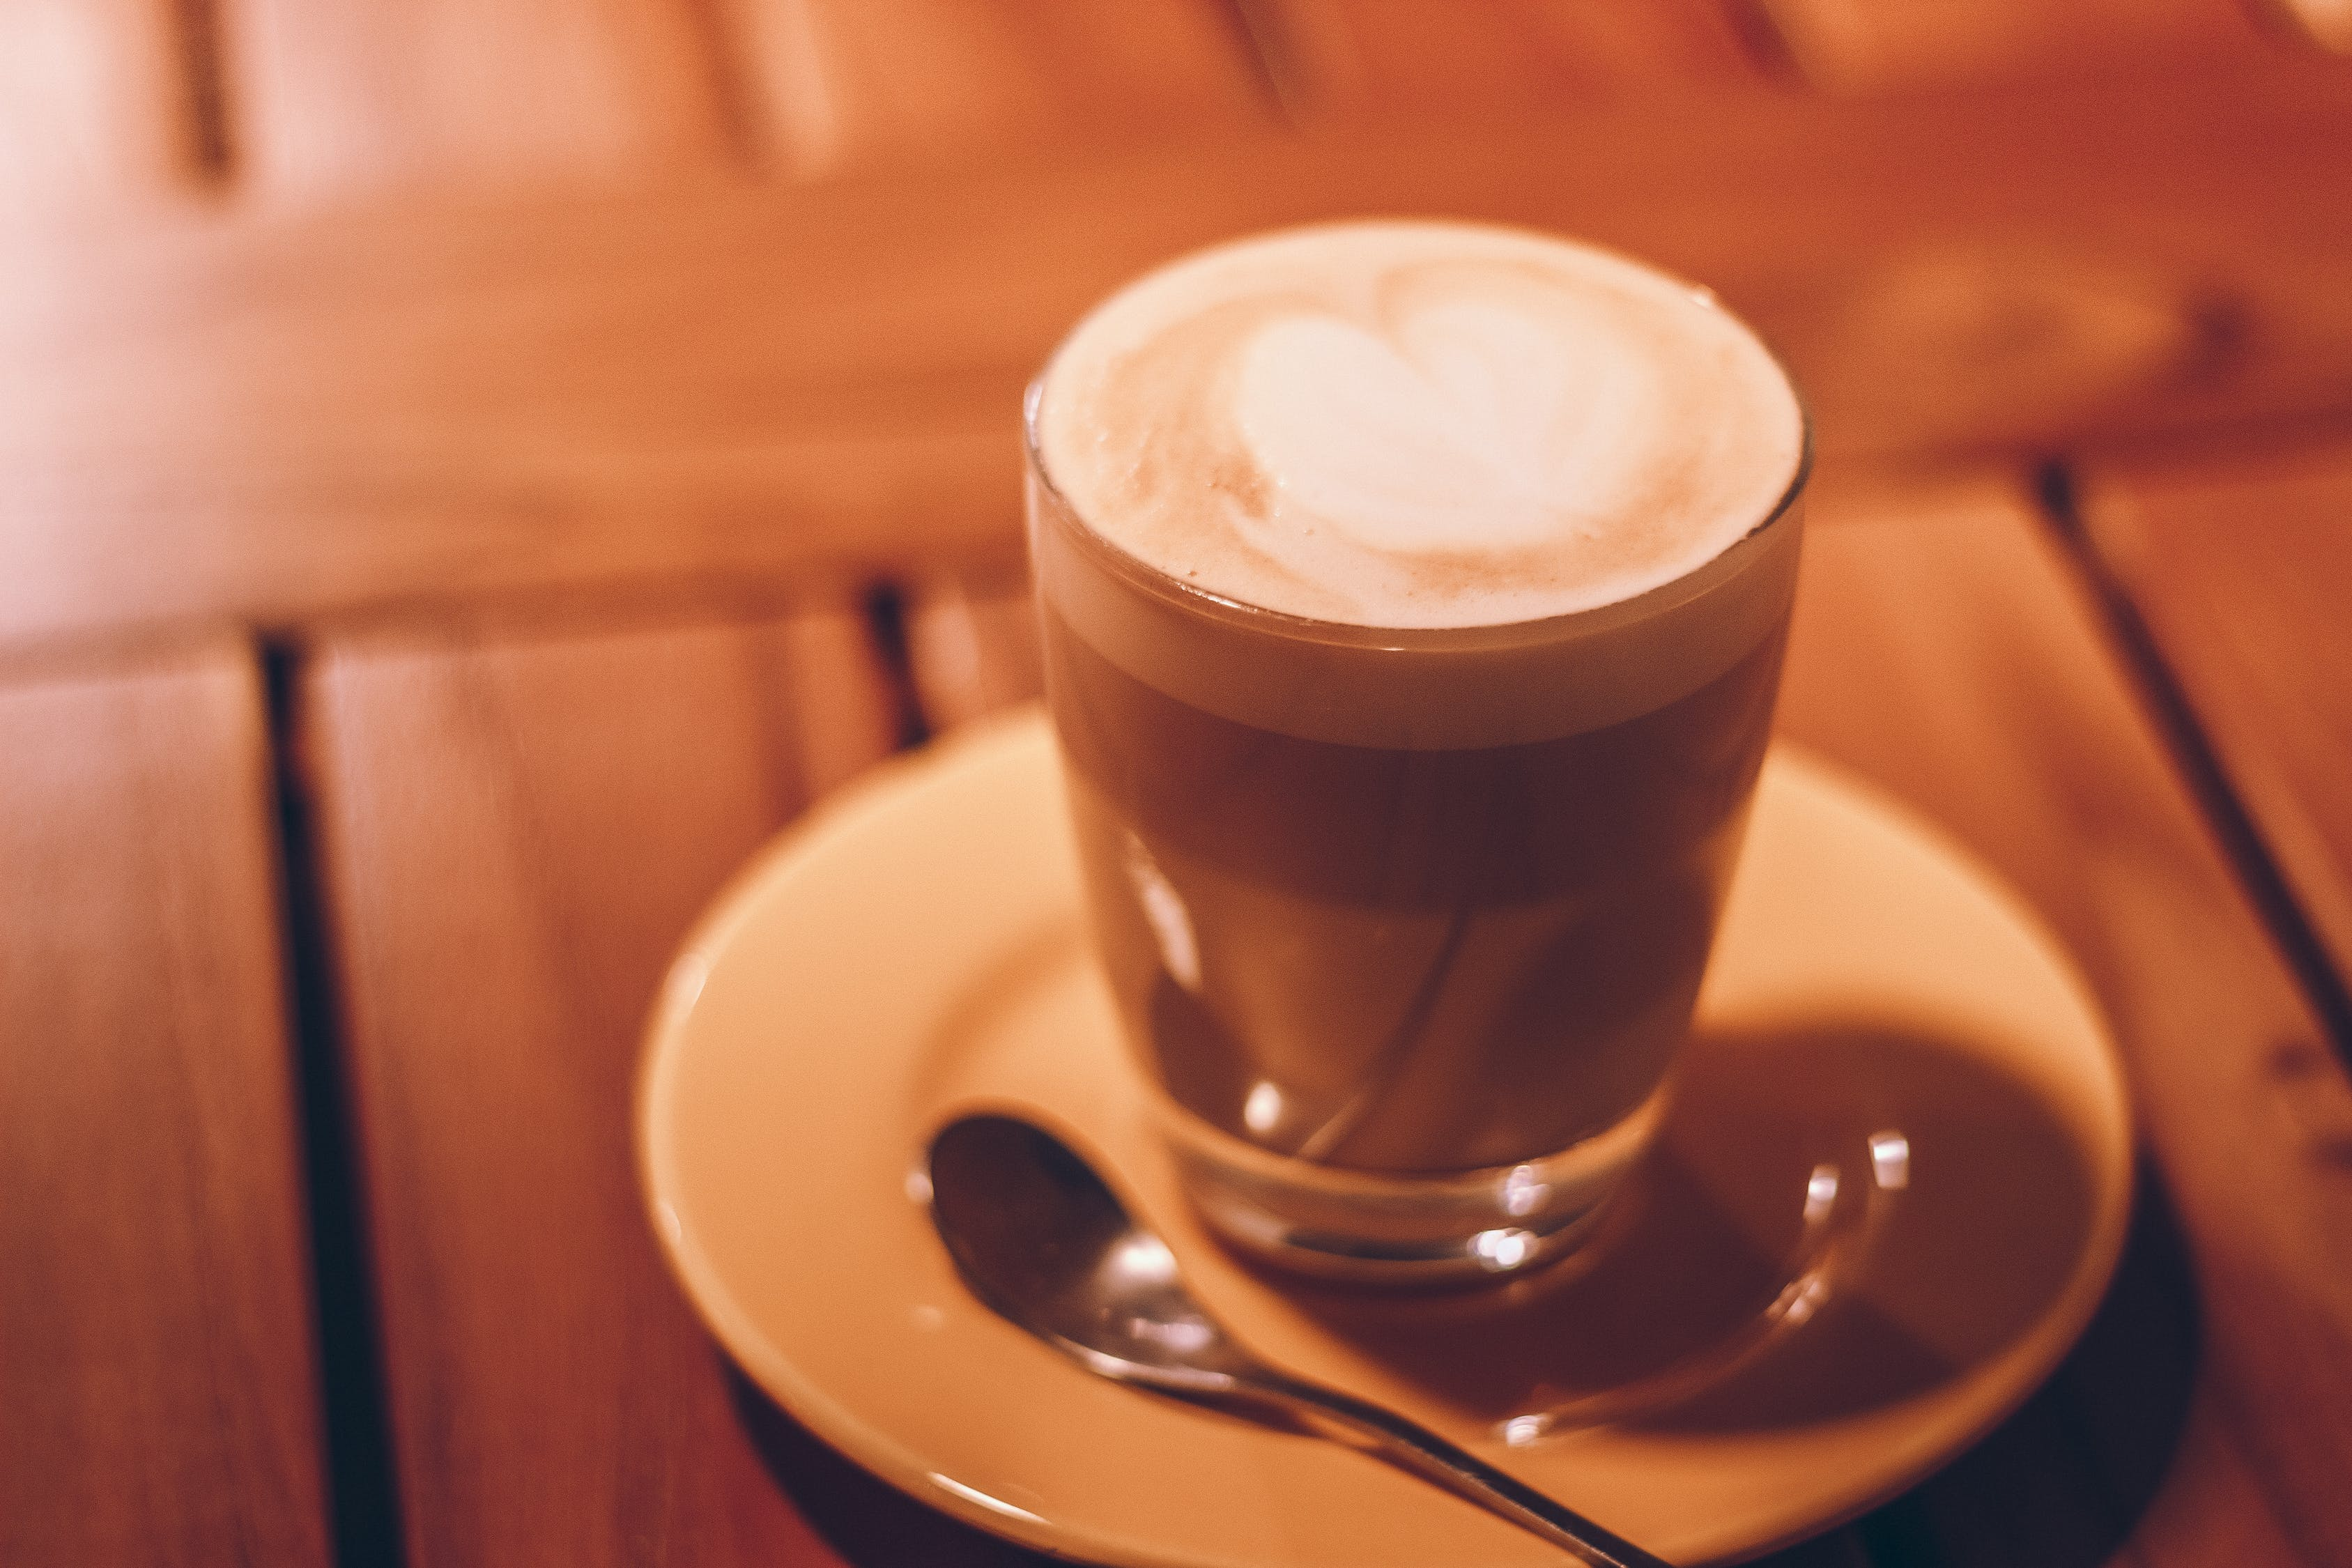 Zajímavosti o Caffé latte